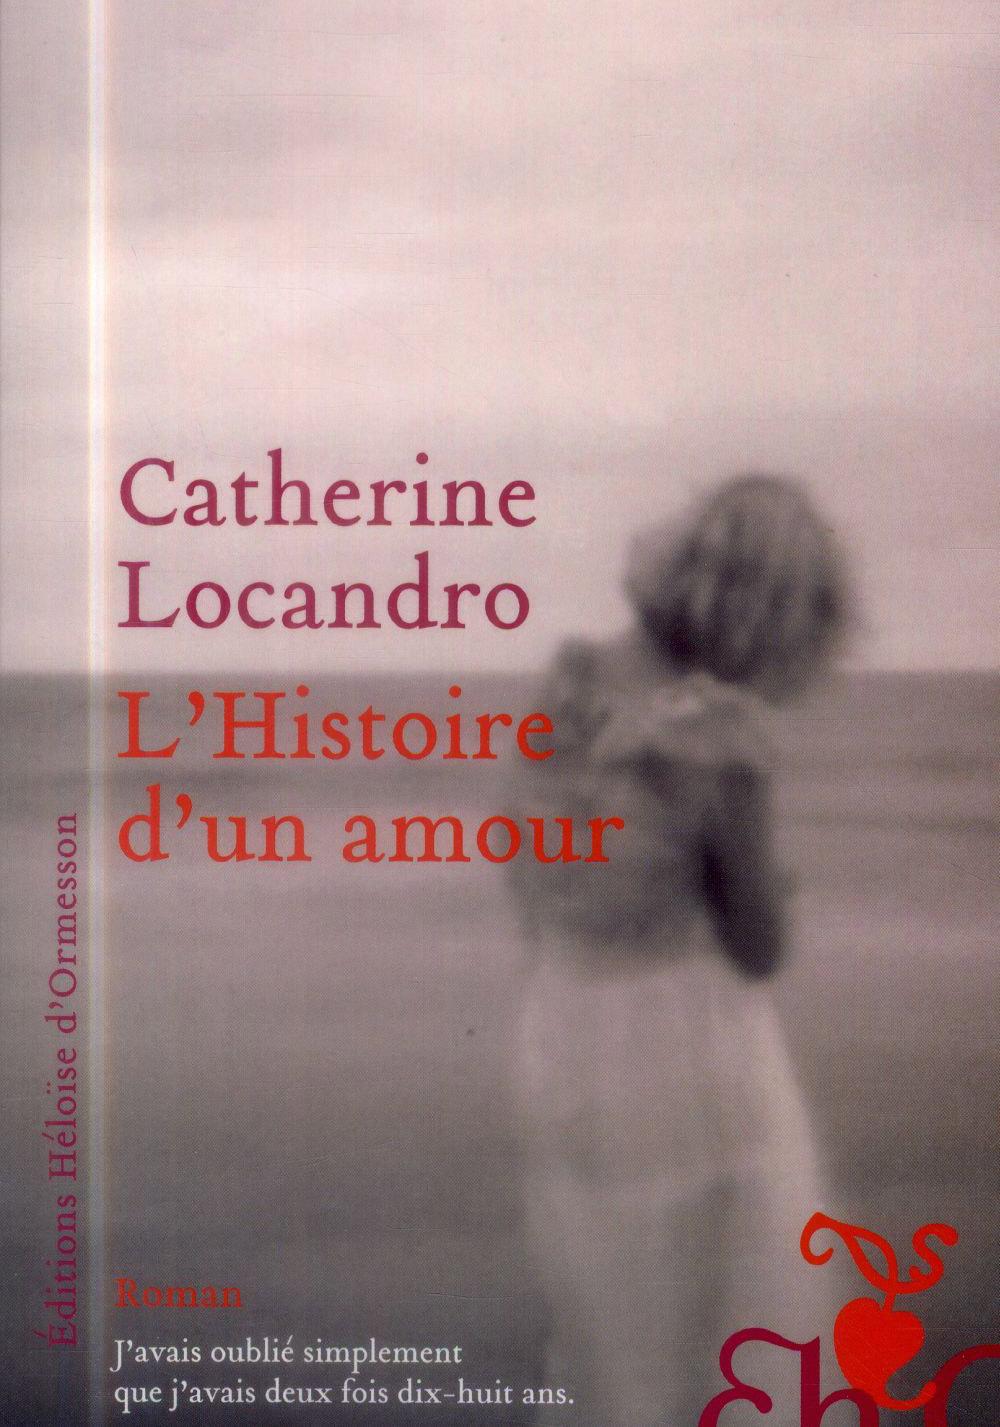 La riposte de Catherine Locandro aux Explorateurs